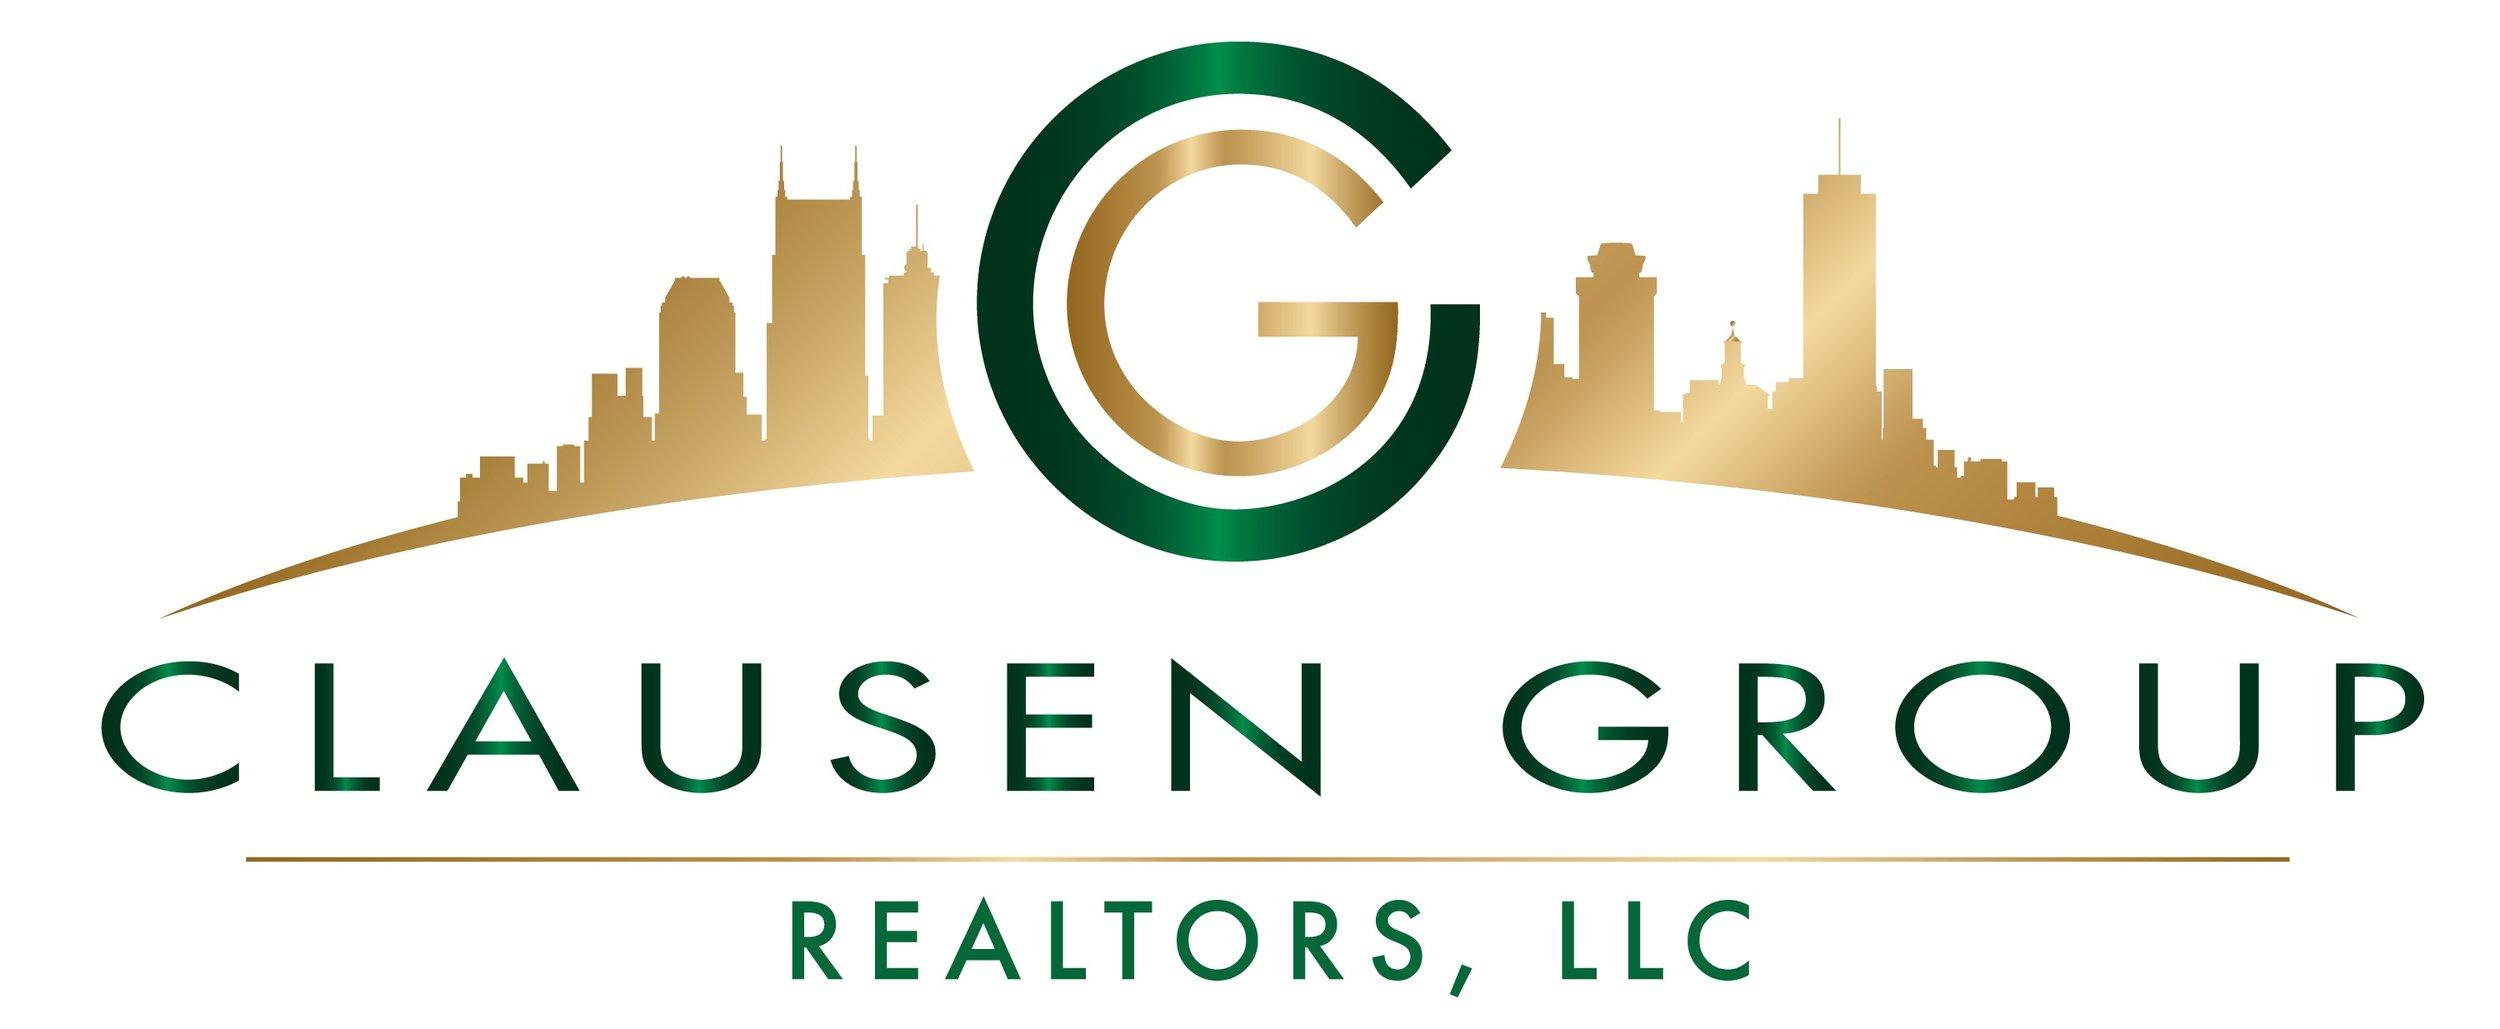 Clausen Group Realtors Large Logo -- JPEG File.jpg